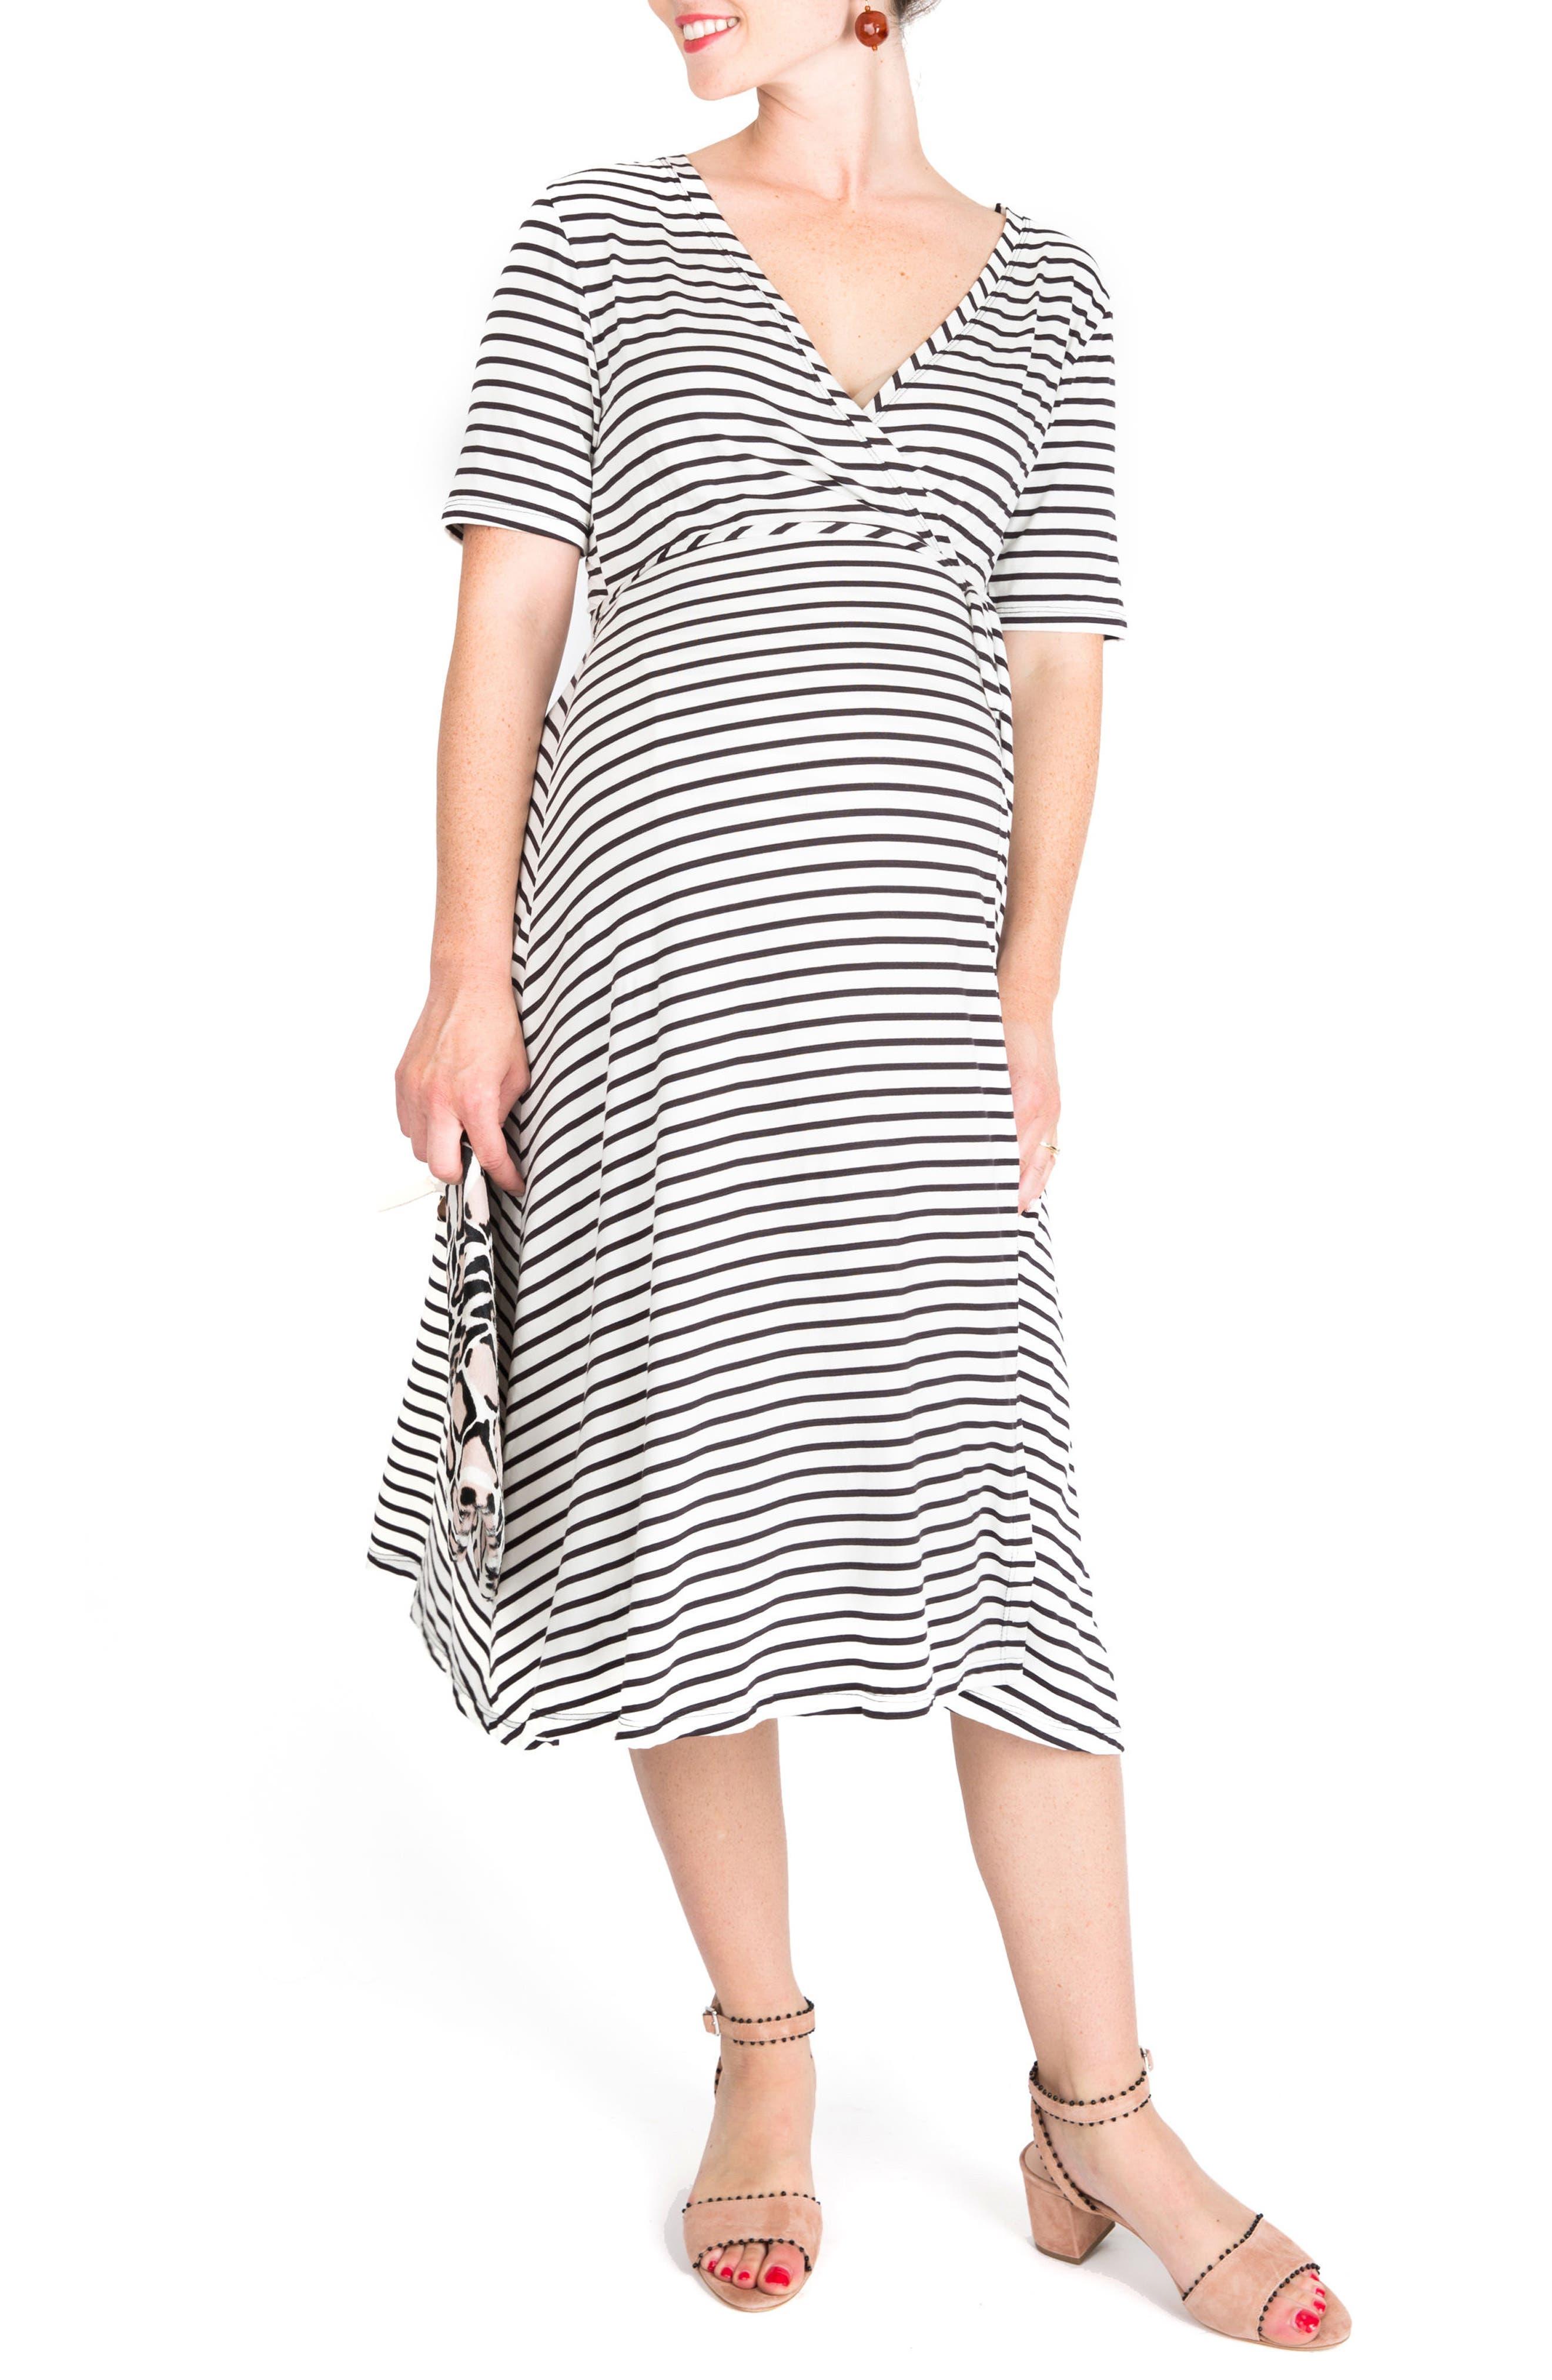 Maya Maternity/Nursing Wrap Dress,                             Main thumbnail 1, color,                             Black/ White Stripe